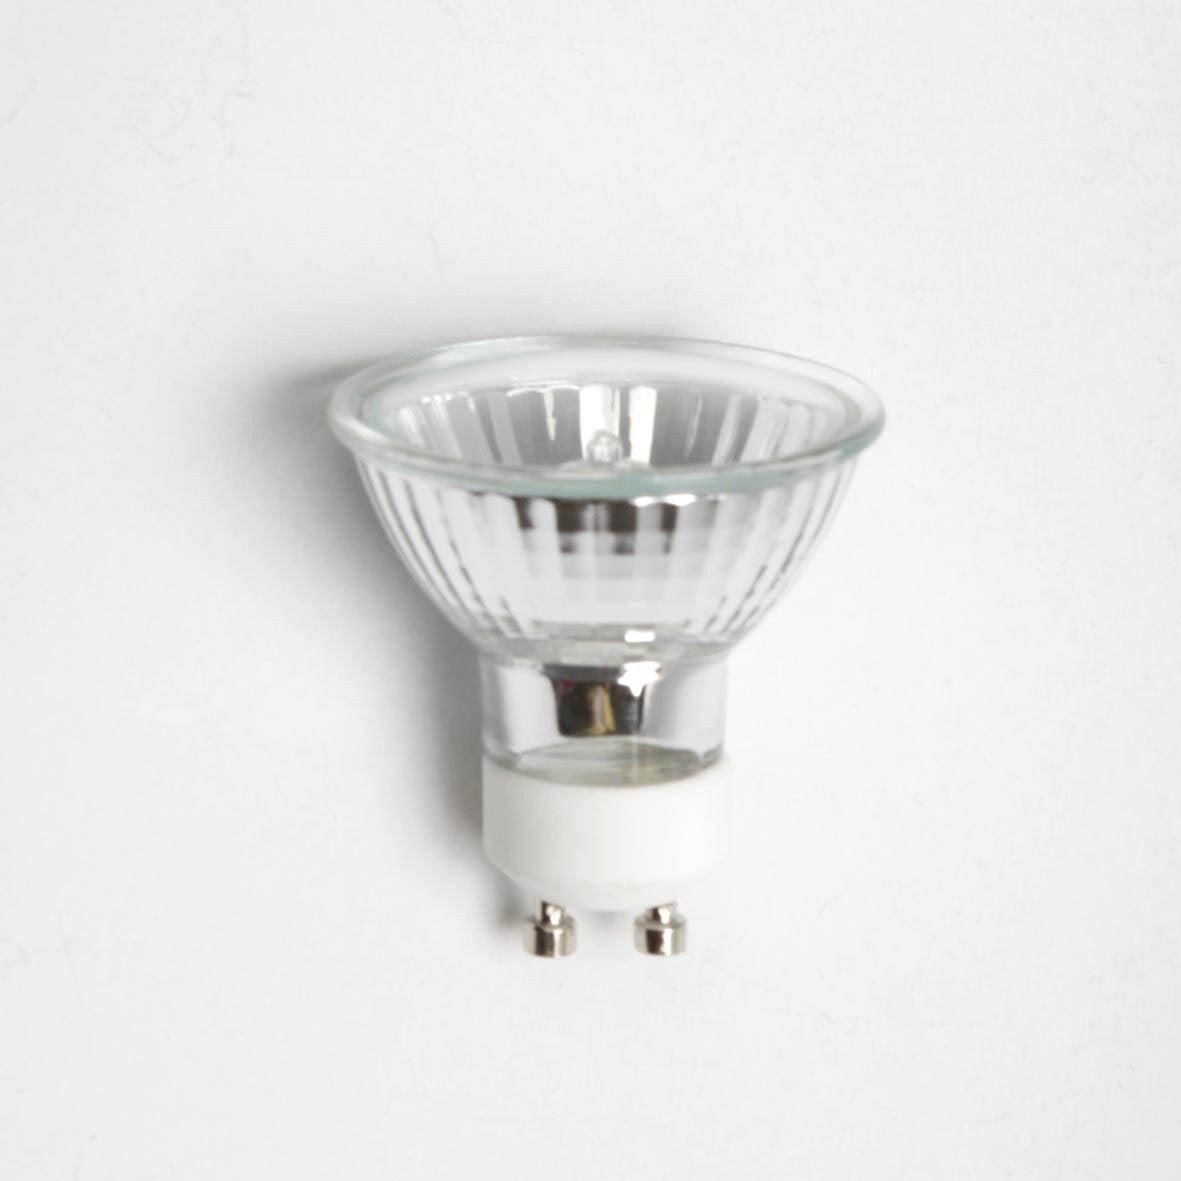 Ampoule R Flecteur Halog Ne 42 Gu10 Lumi Re Chaude Environ 2700 K Leroy Merlin